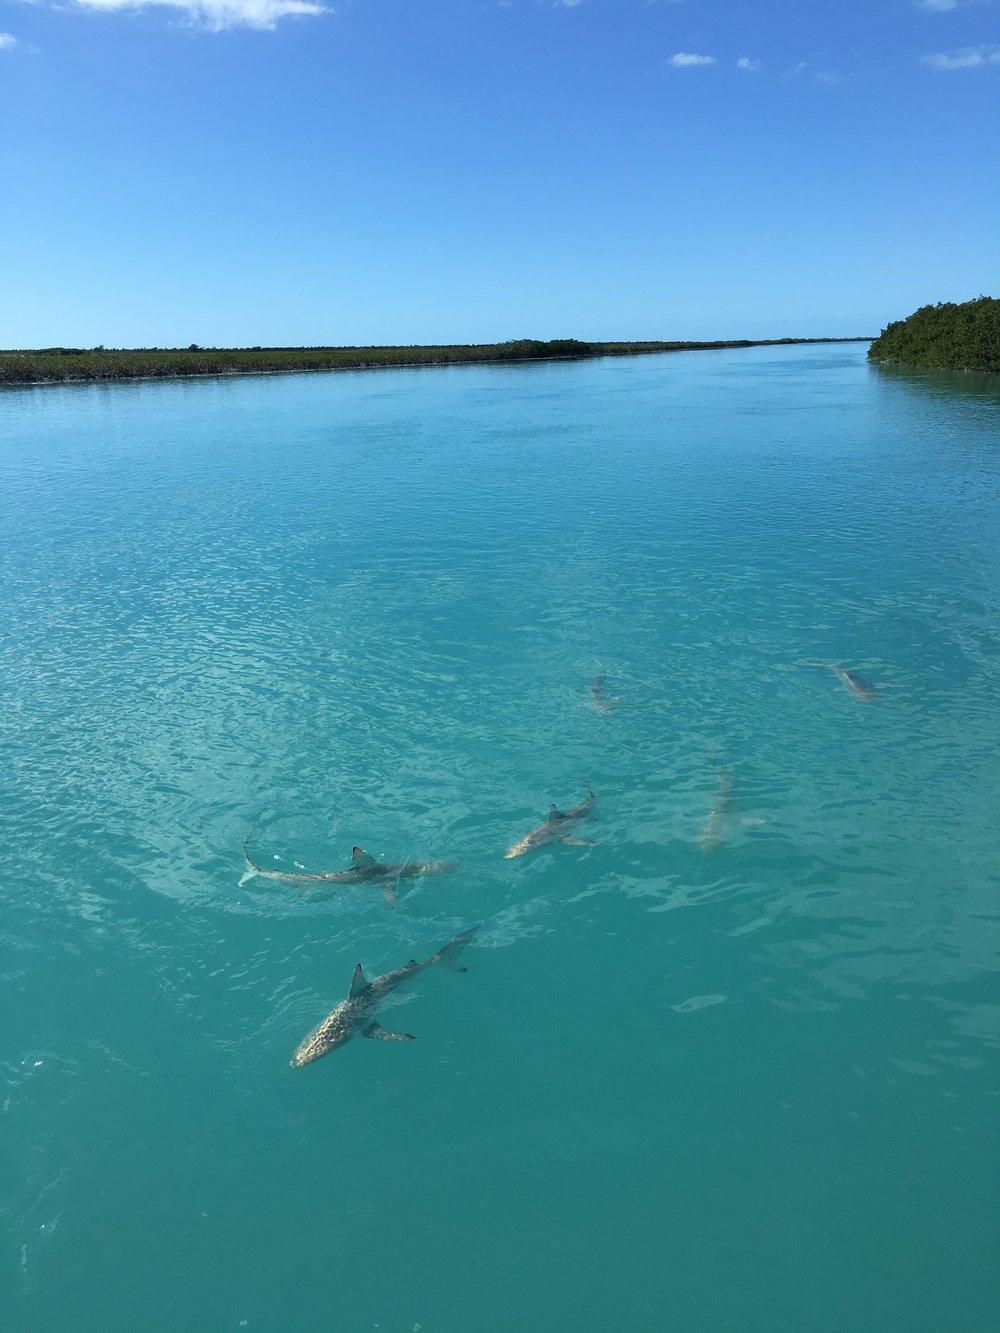 Sharks everywhere!